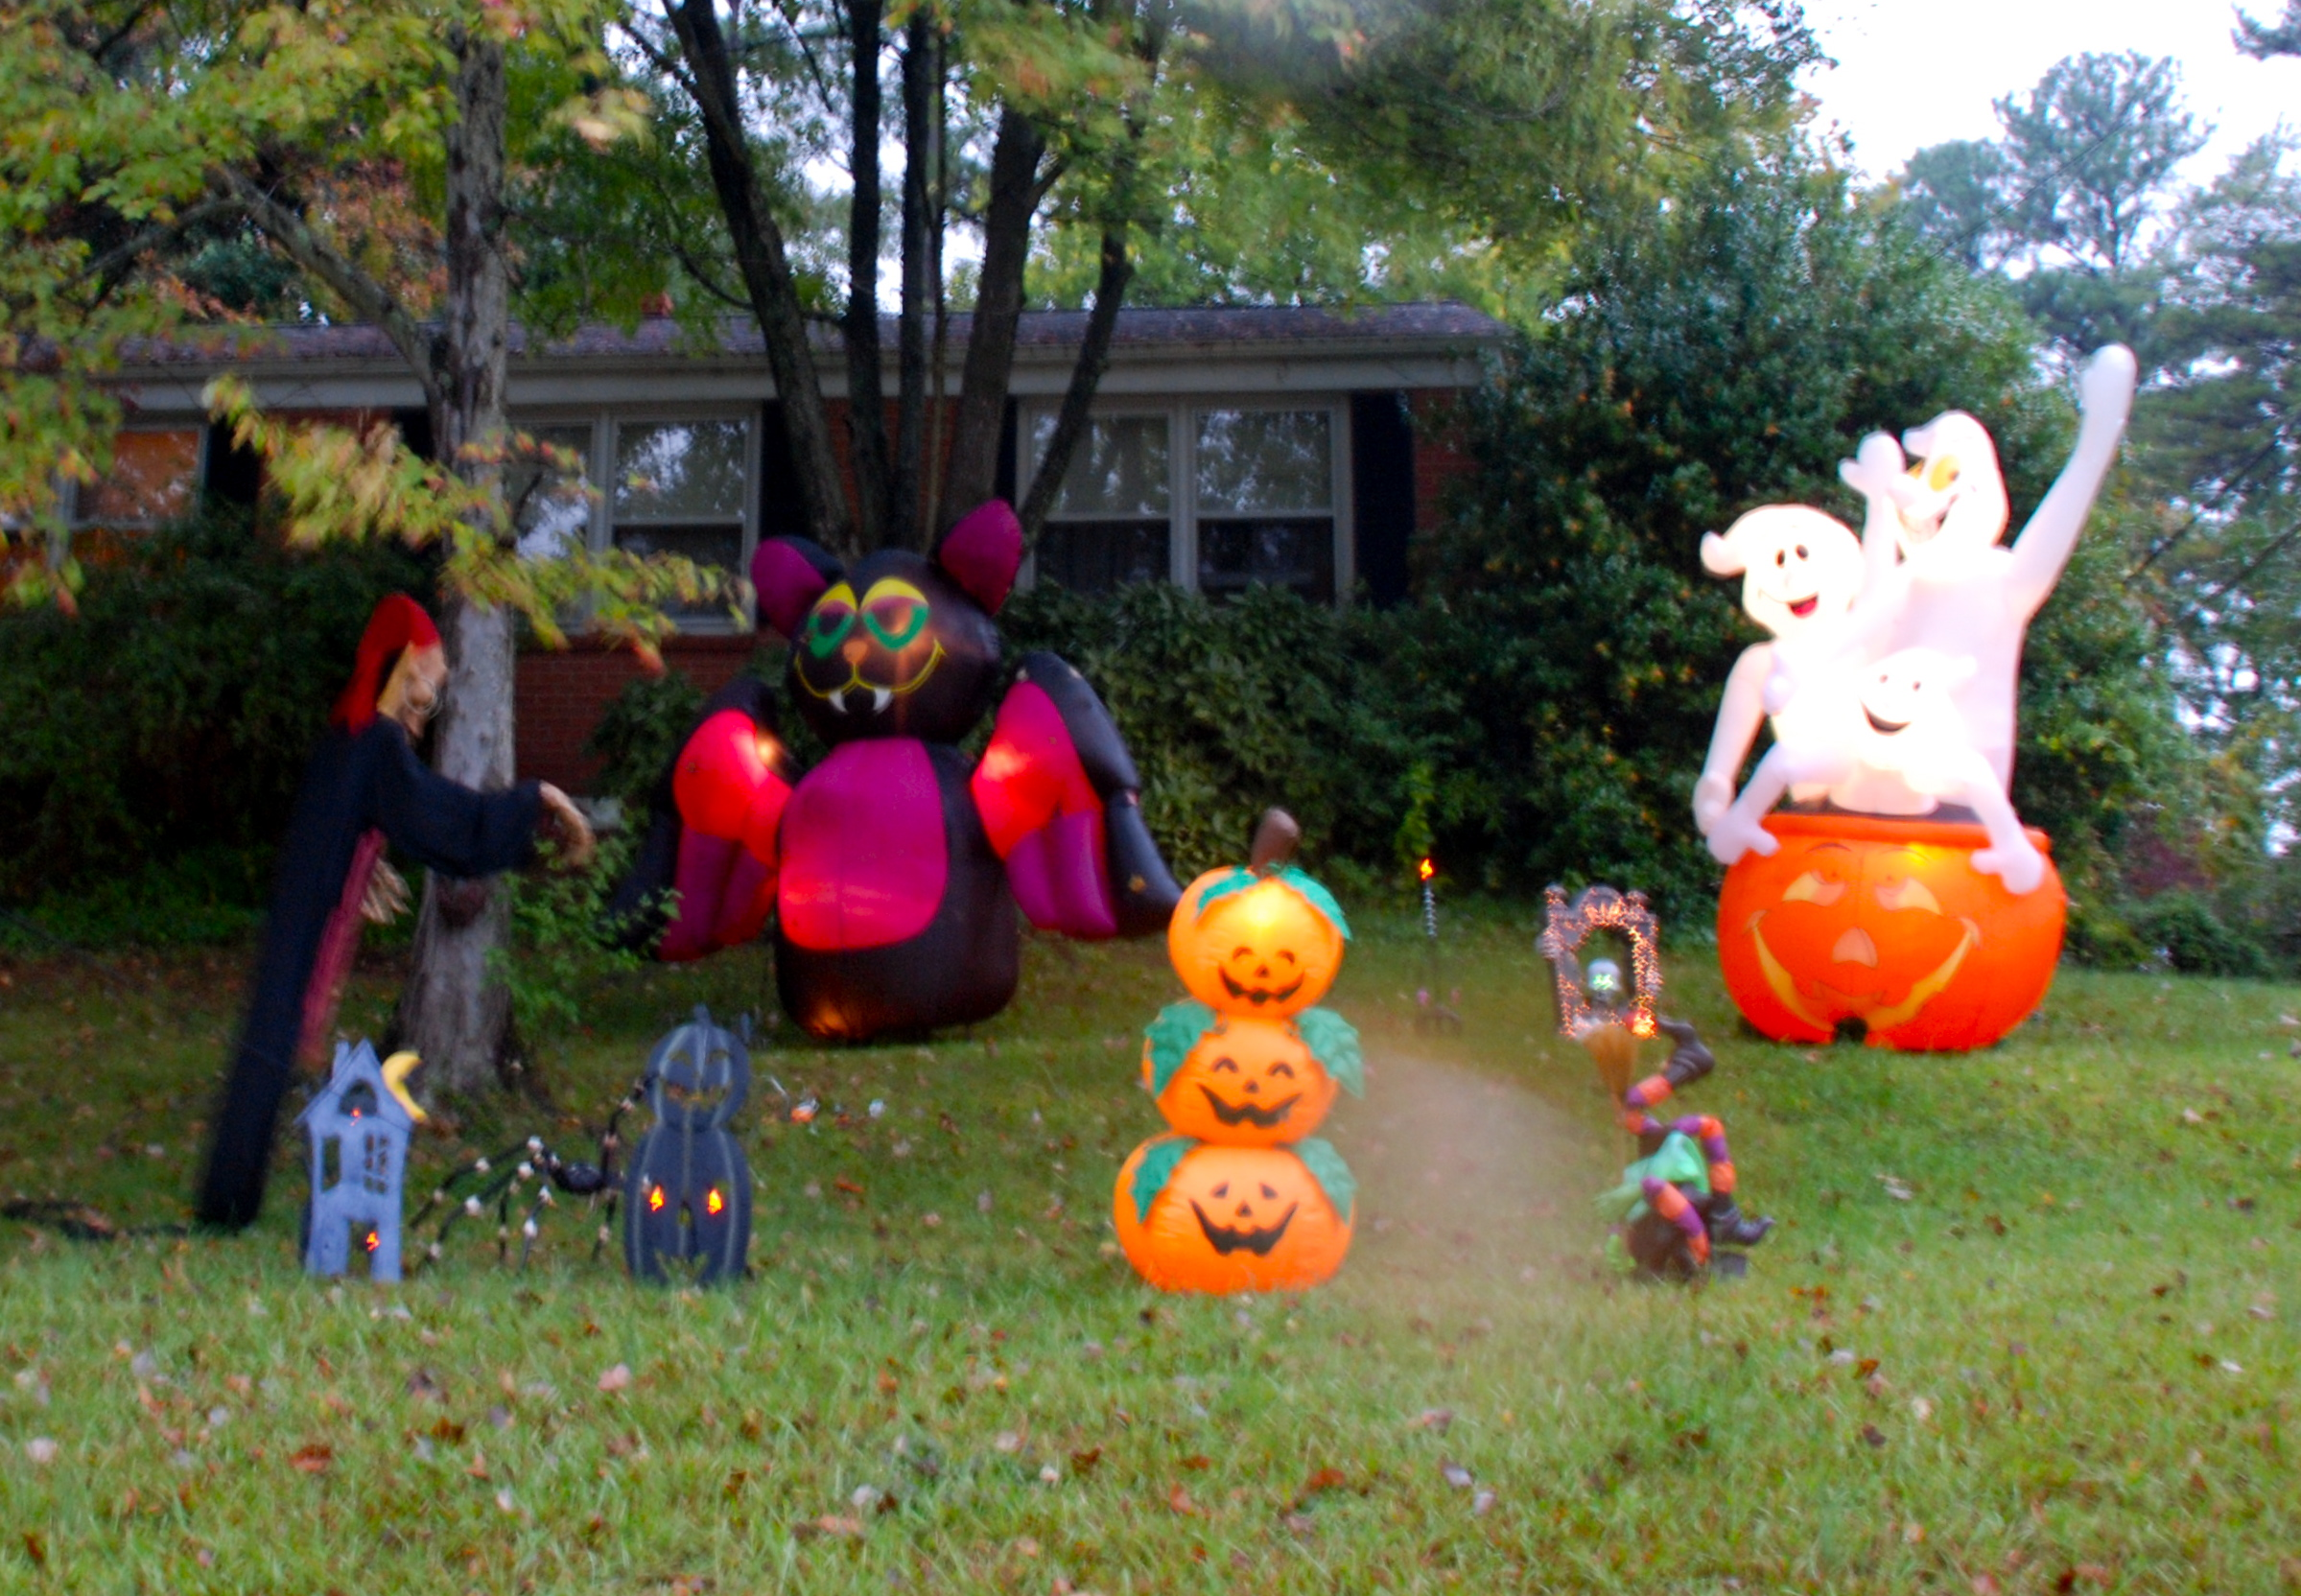 halloween inflatables - Halloween Inflatable Yard Decorations